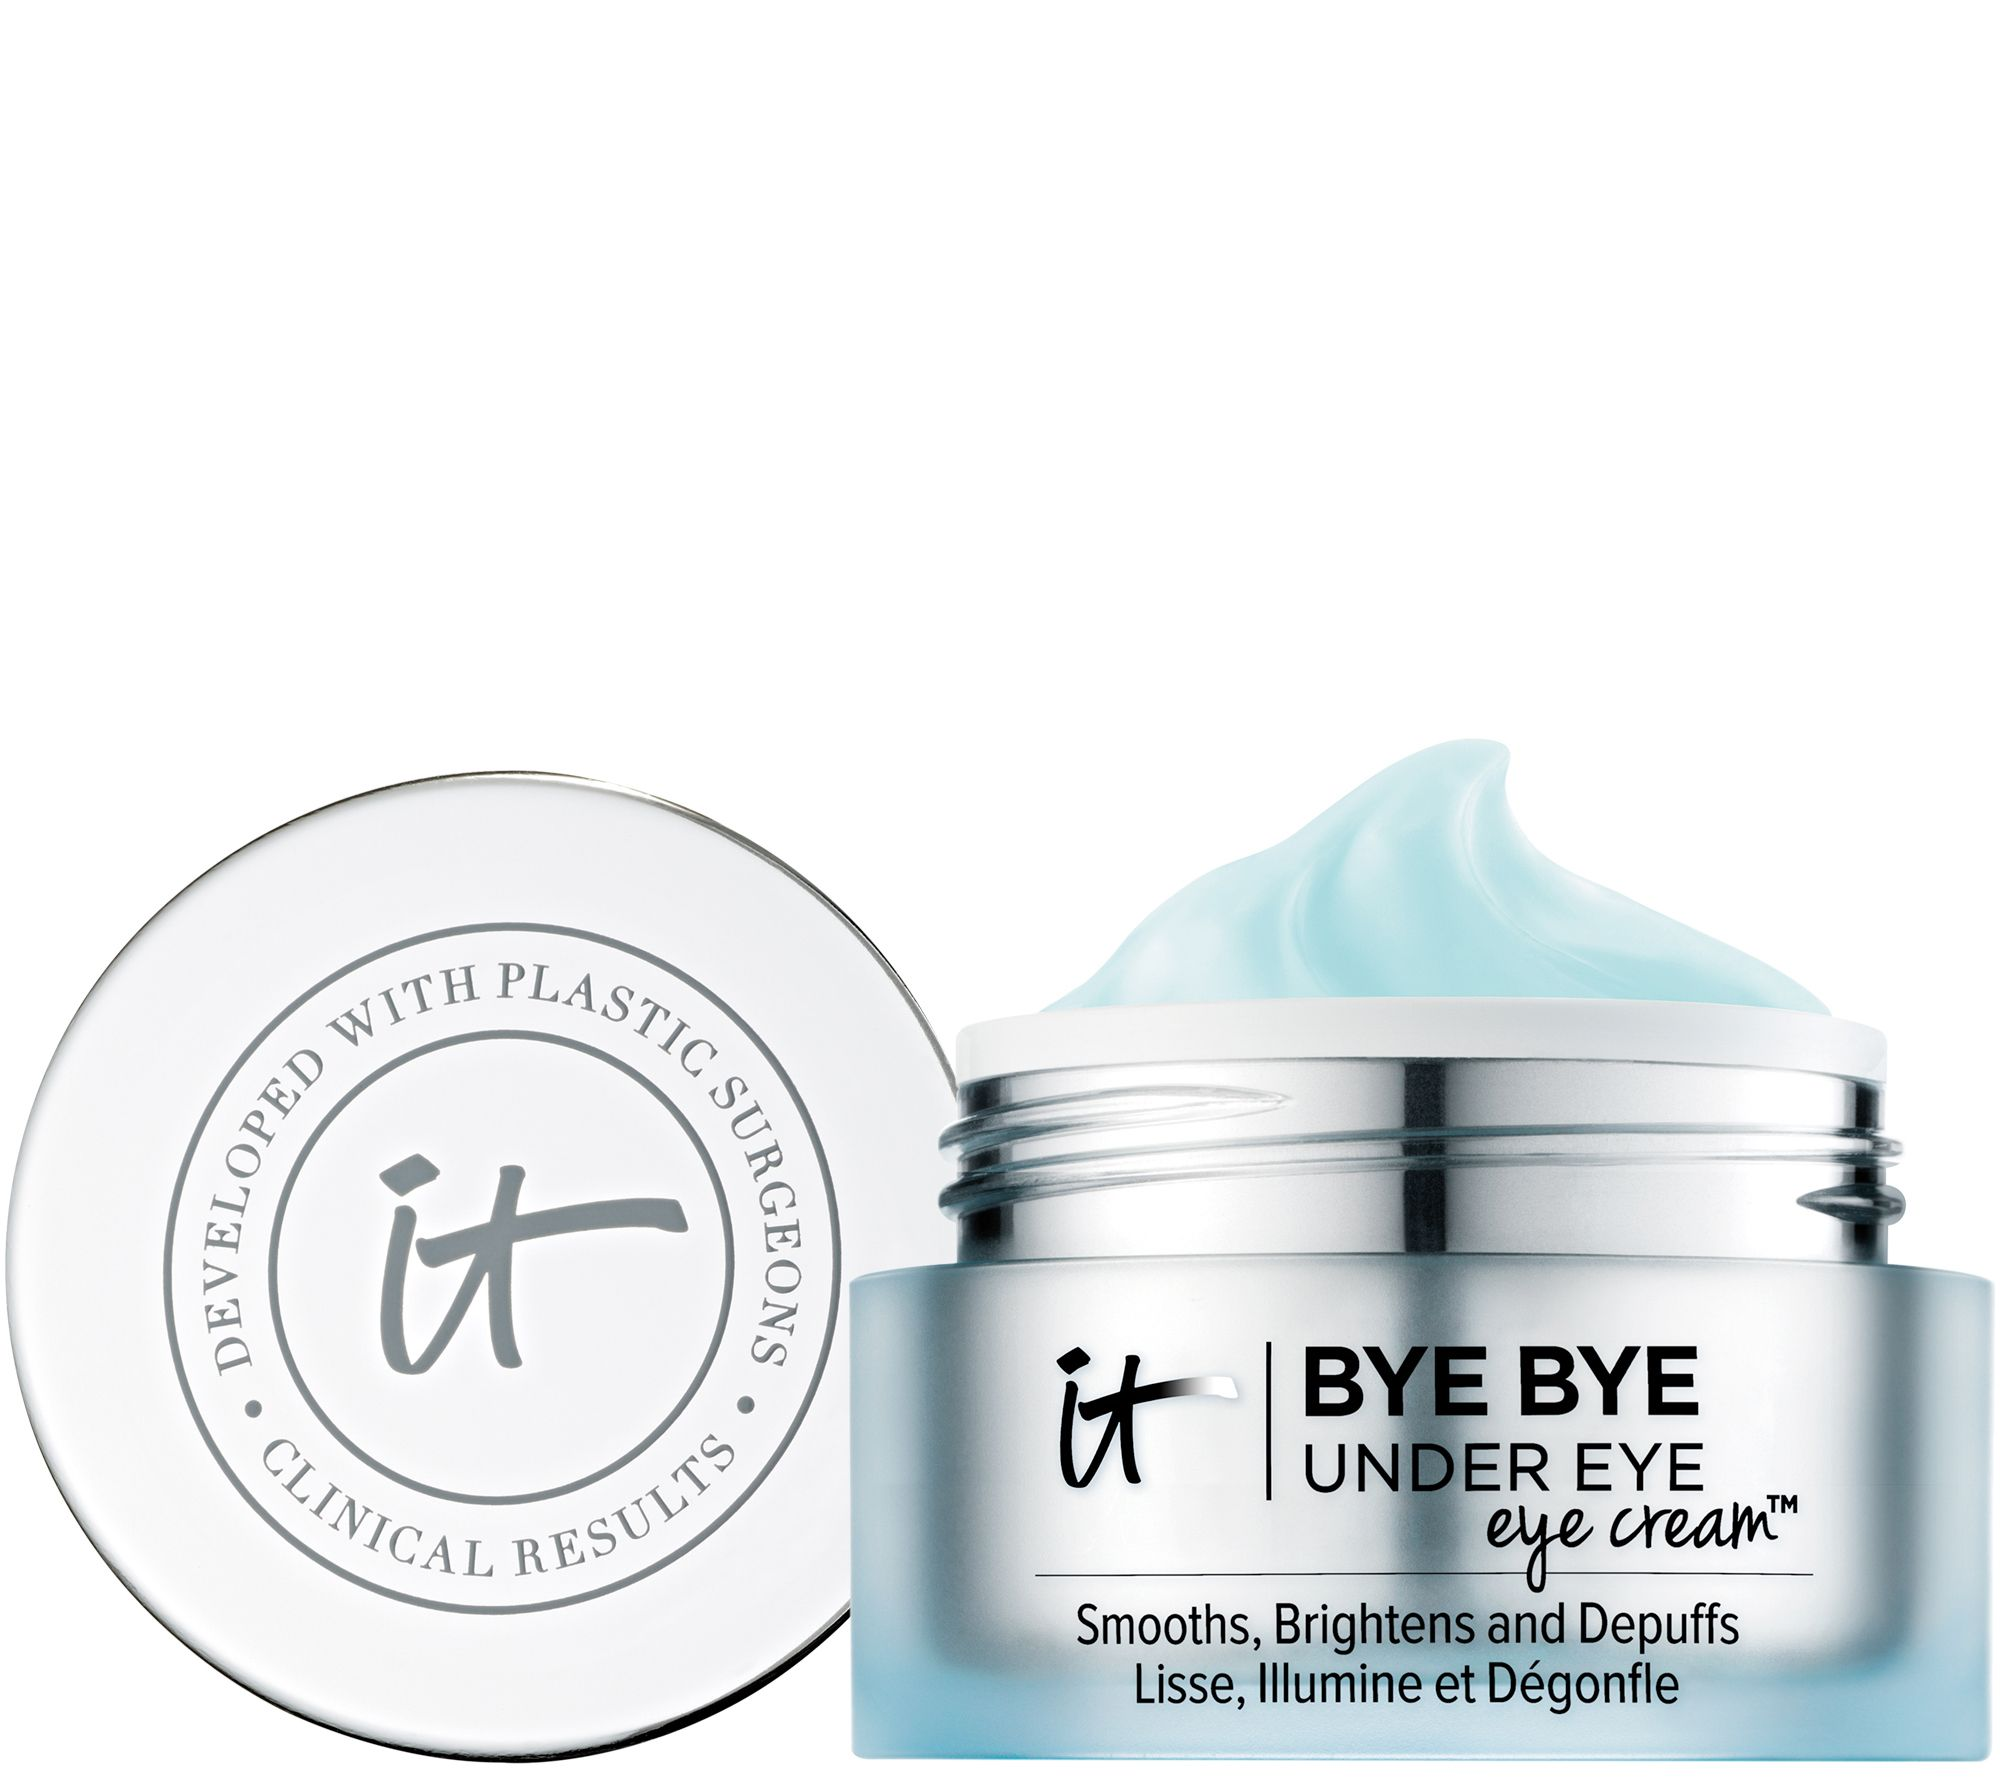 IT Cosmetics Bye Bye Under Eye Anti-Aging Treatment Eye Cream - Page 1 —  QVC.com e0f8a42742e1